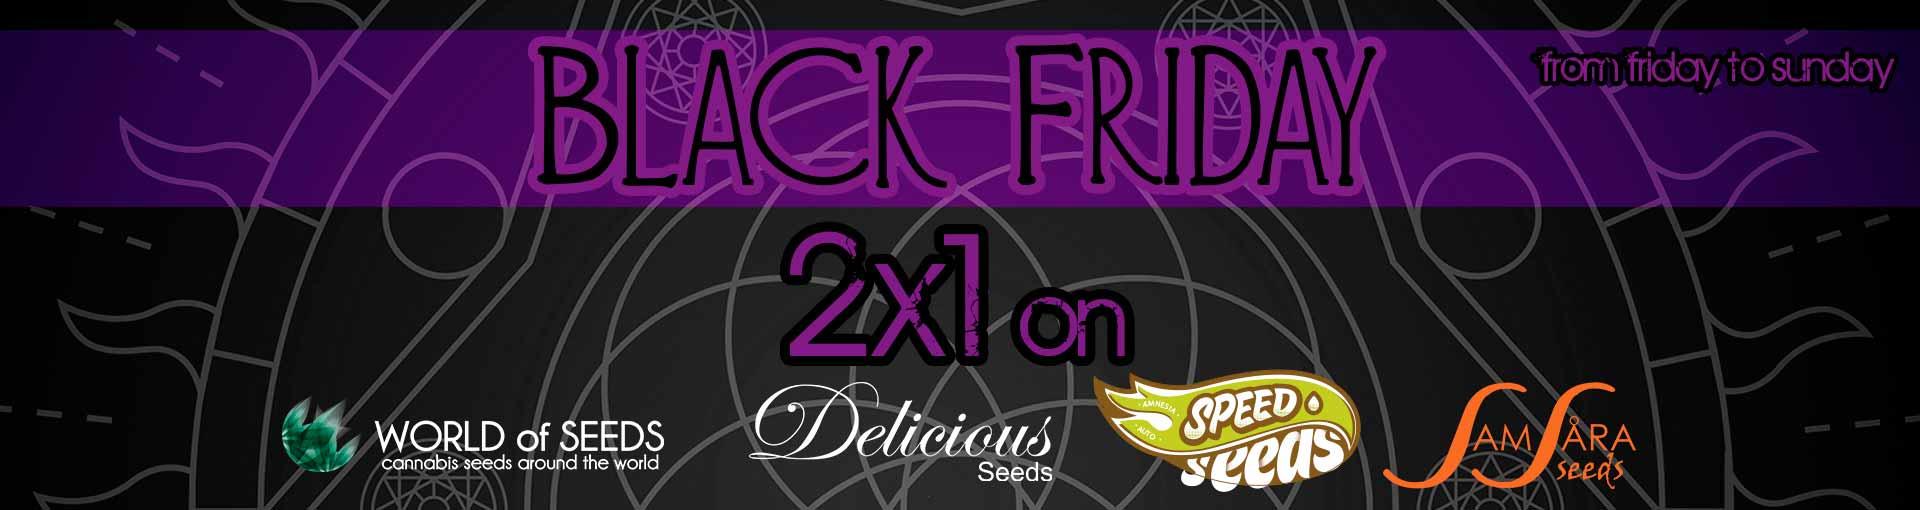 BLACK FRIDAY - 2x1